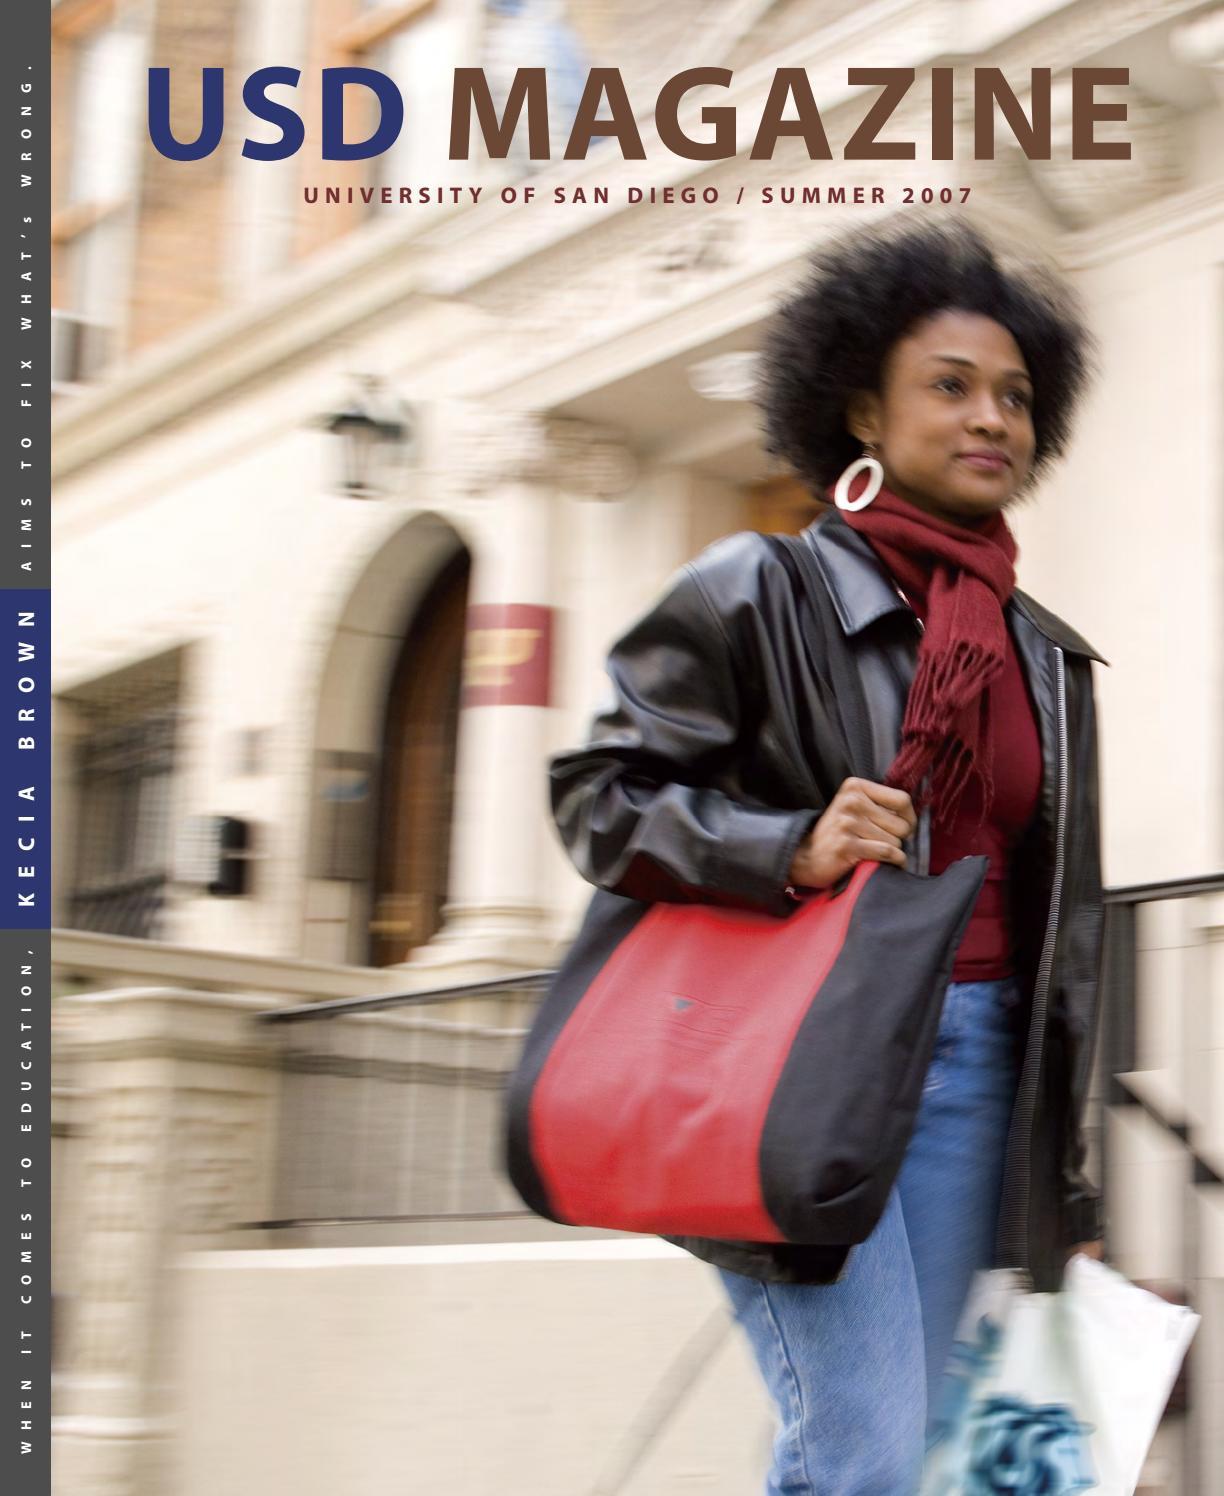 bb485bb0a514f Summer 2007 USD Magazine by University of San Diego - issuu